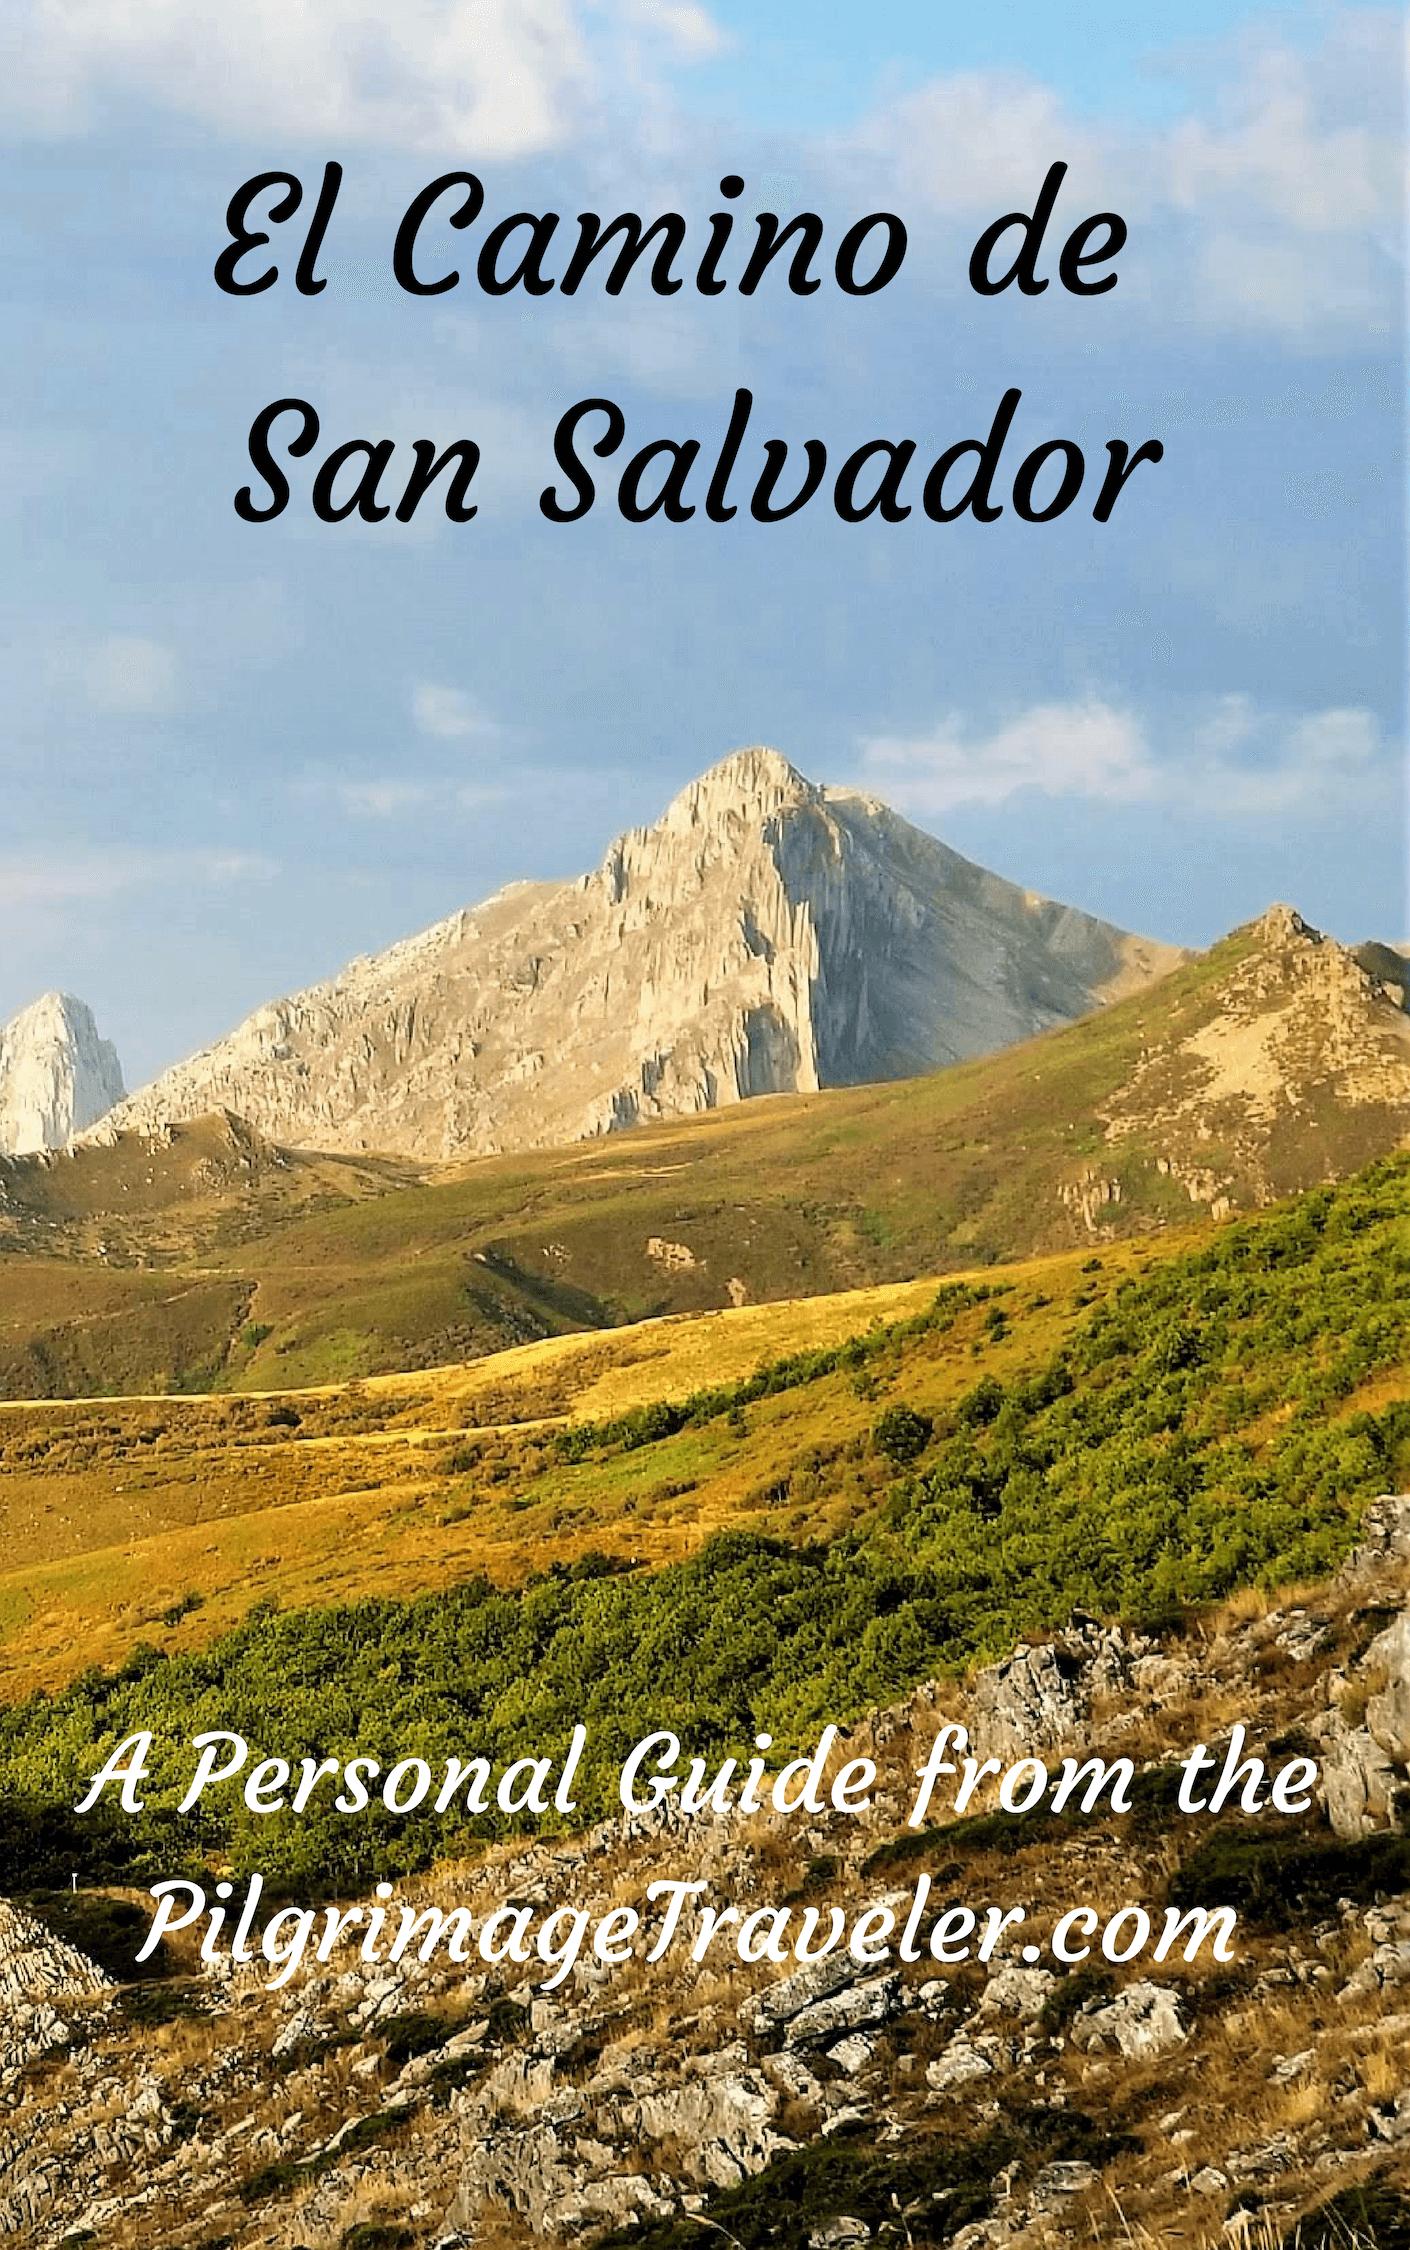 Camino de San Salvador Digital EBook Guide, Copyright 2019